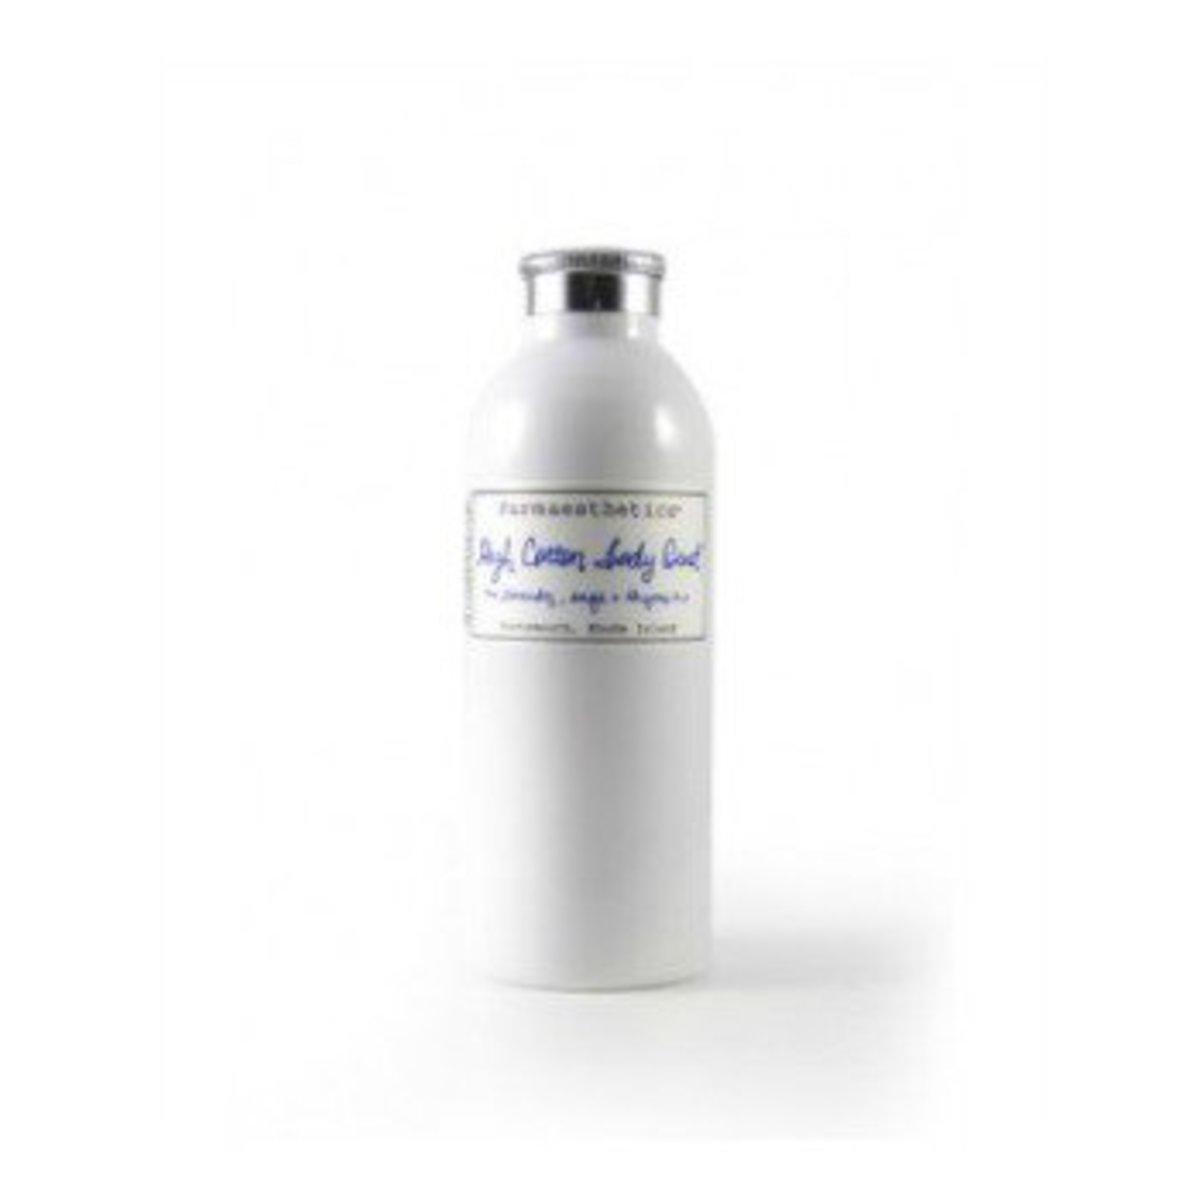 Farmaesthetics High Cotton Body Dust